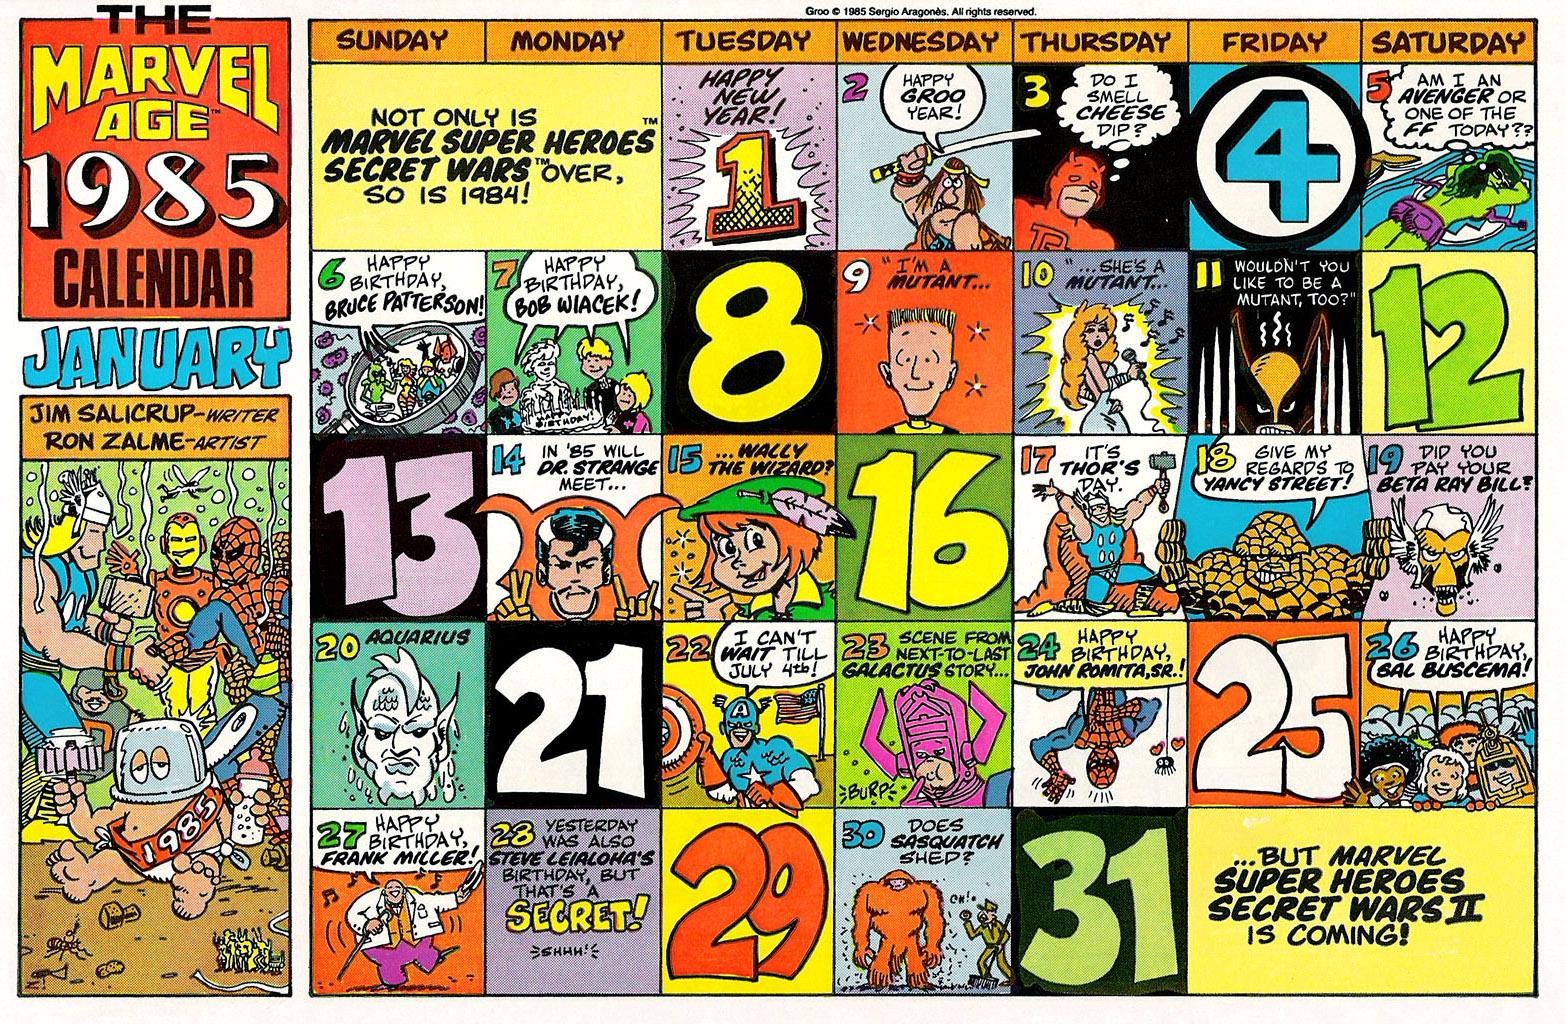 Marvel Comics Of The 1980s 1985 January Calendar